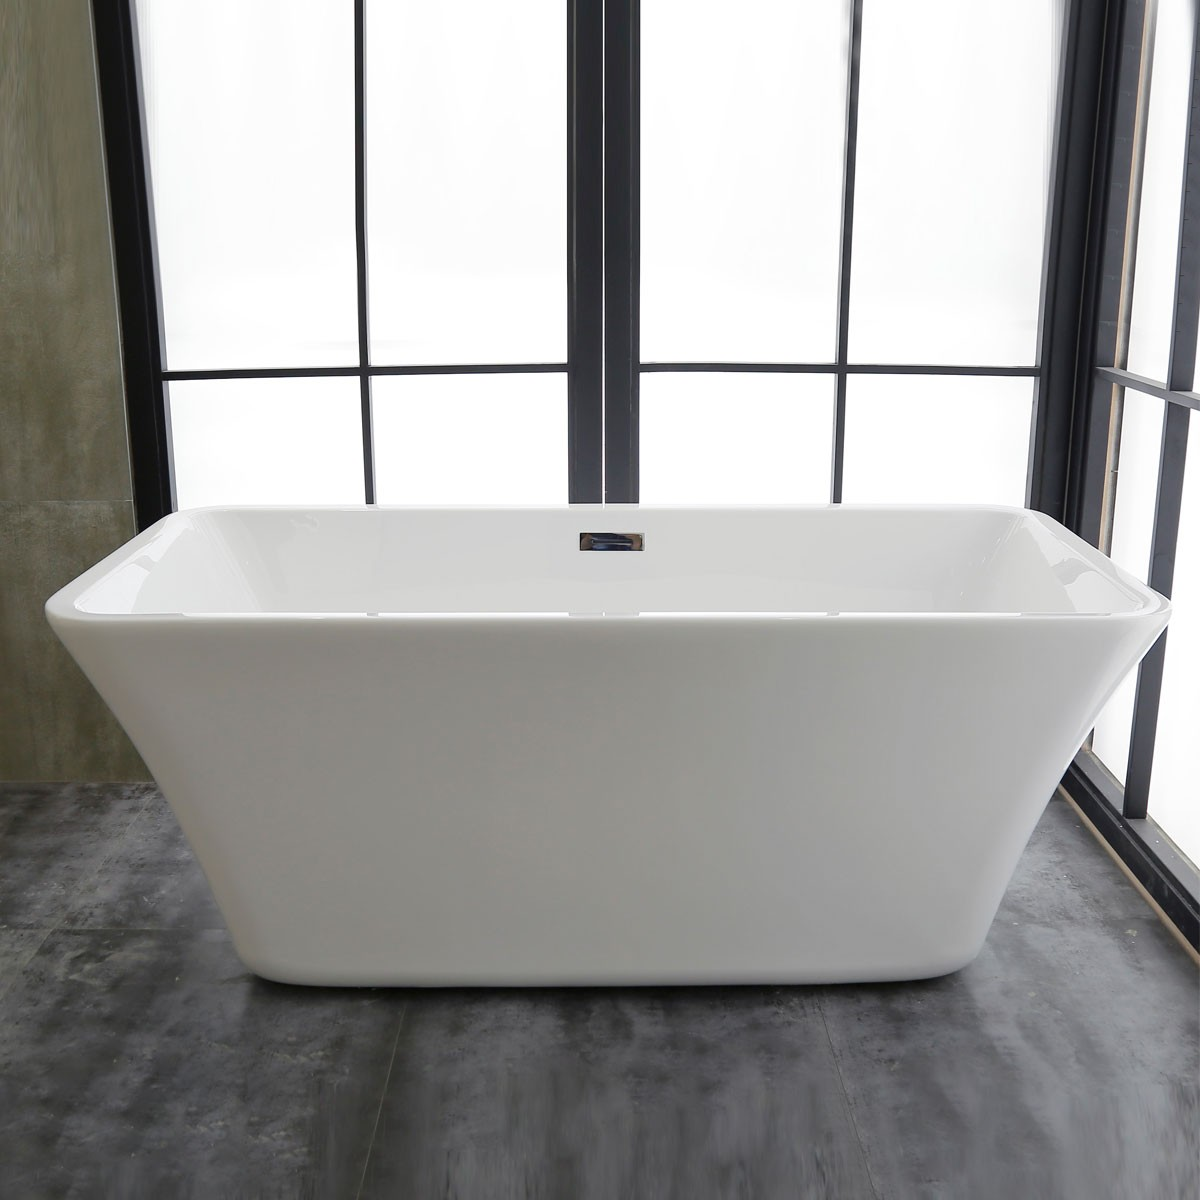 59 In Acrylic White Freestanding Bathtub (DK-MEC3047A)